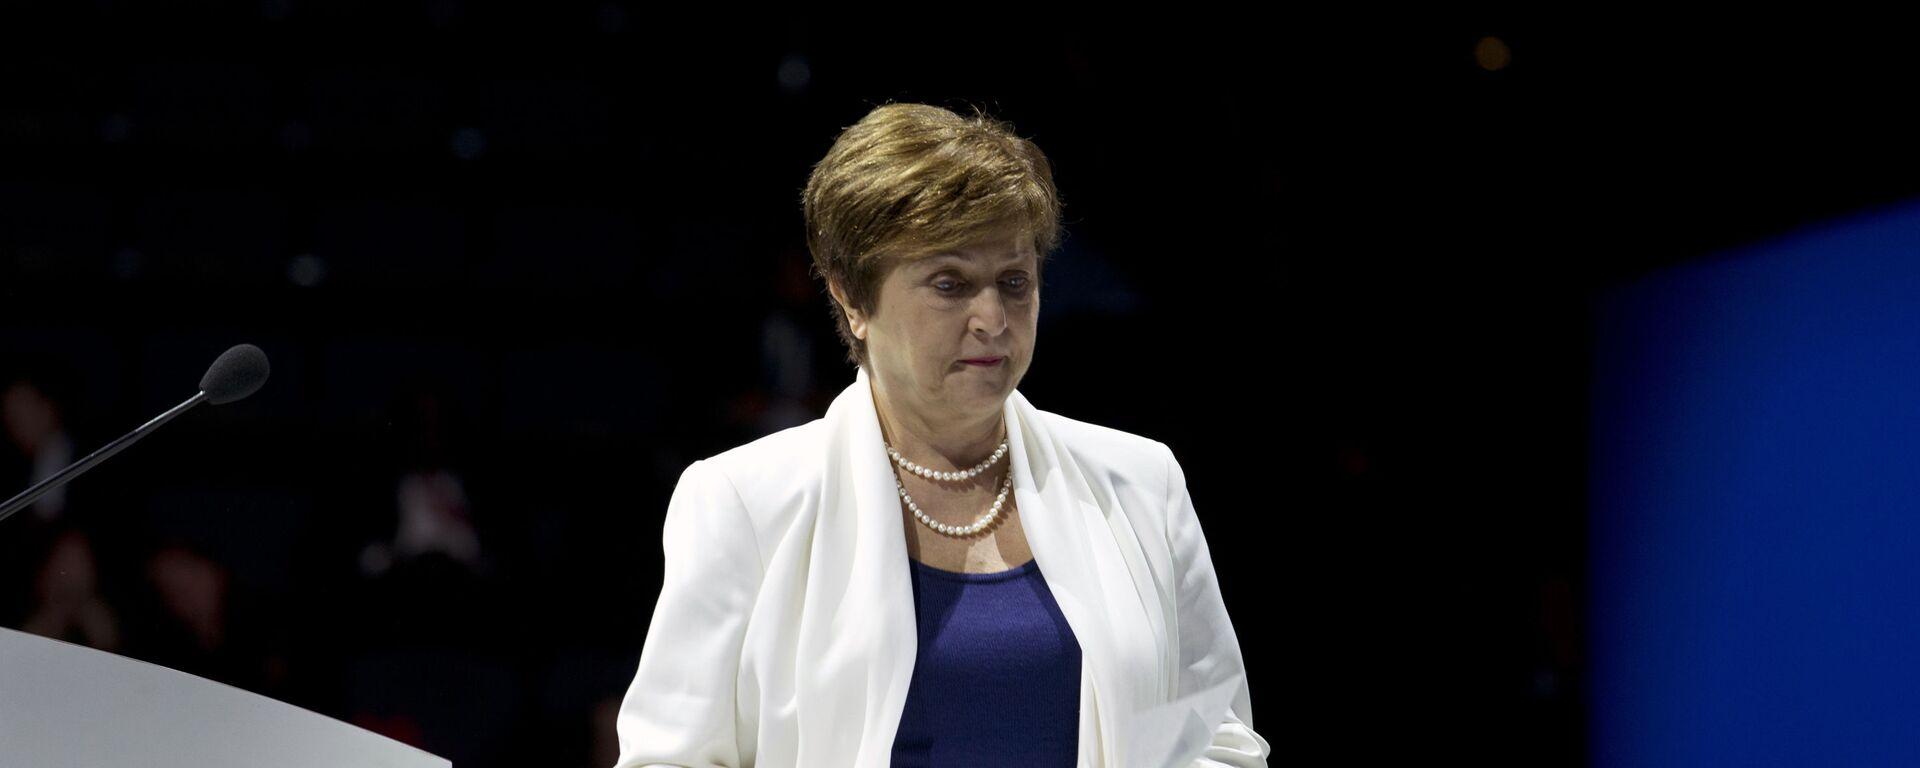 Kristalina Georgiewa, la directora gerente del FMI - Sputnik Mundo, 1920, 21.01.2021